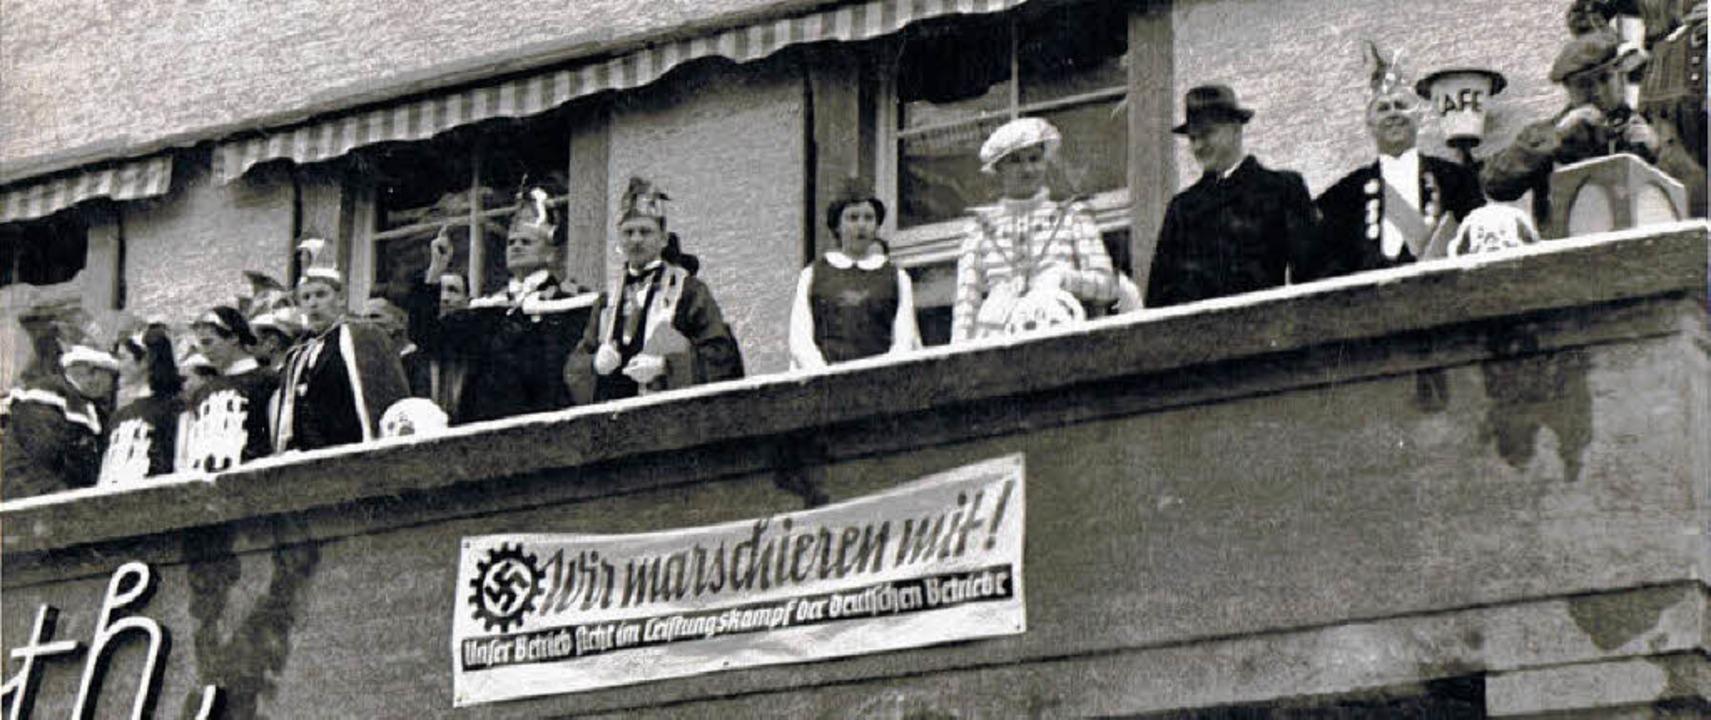 Ehrentribüne auf dem Balkon des Hotels...Obergildenmeister Johann Maier-Muser    | Foto:  Archiv Narrengilde Lörrach